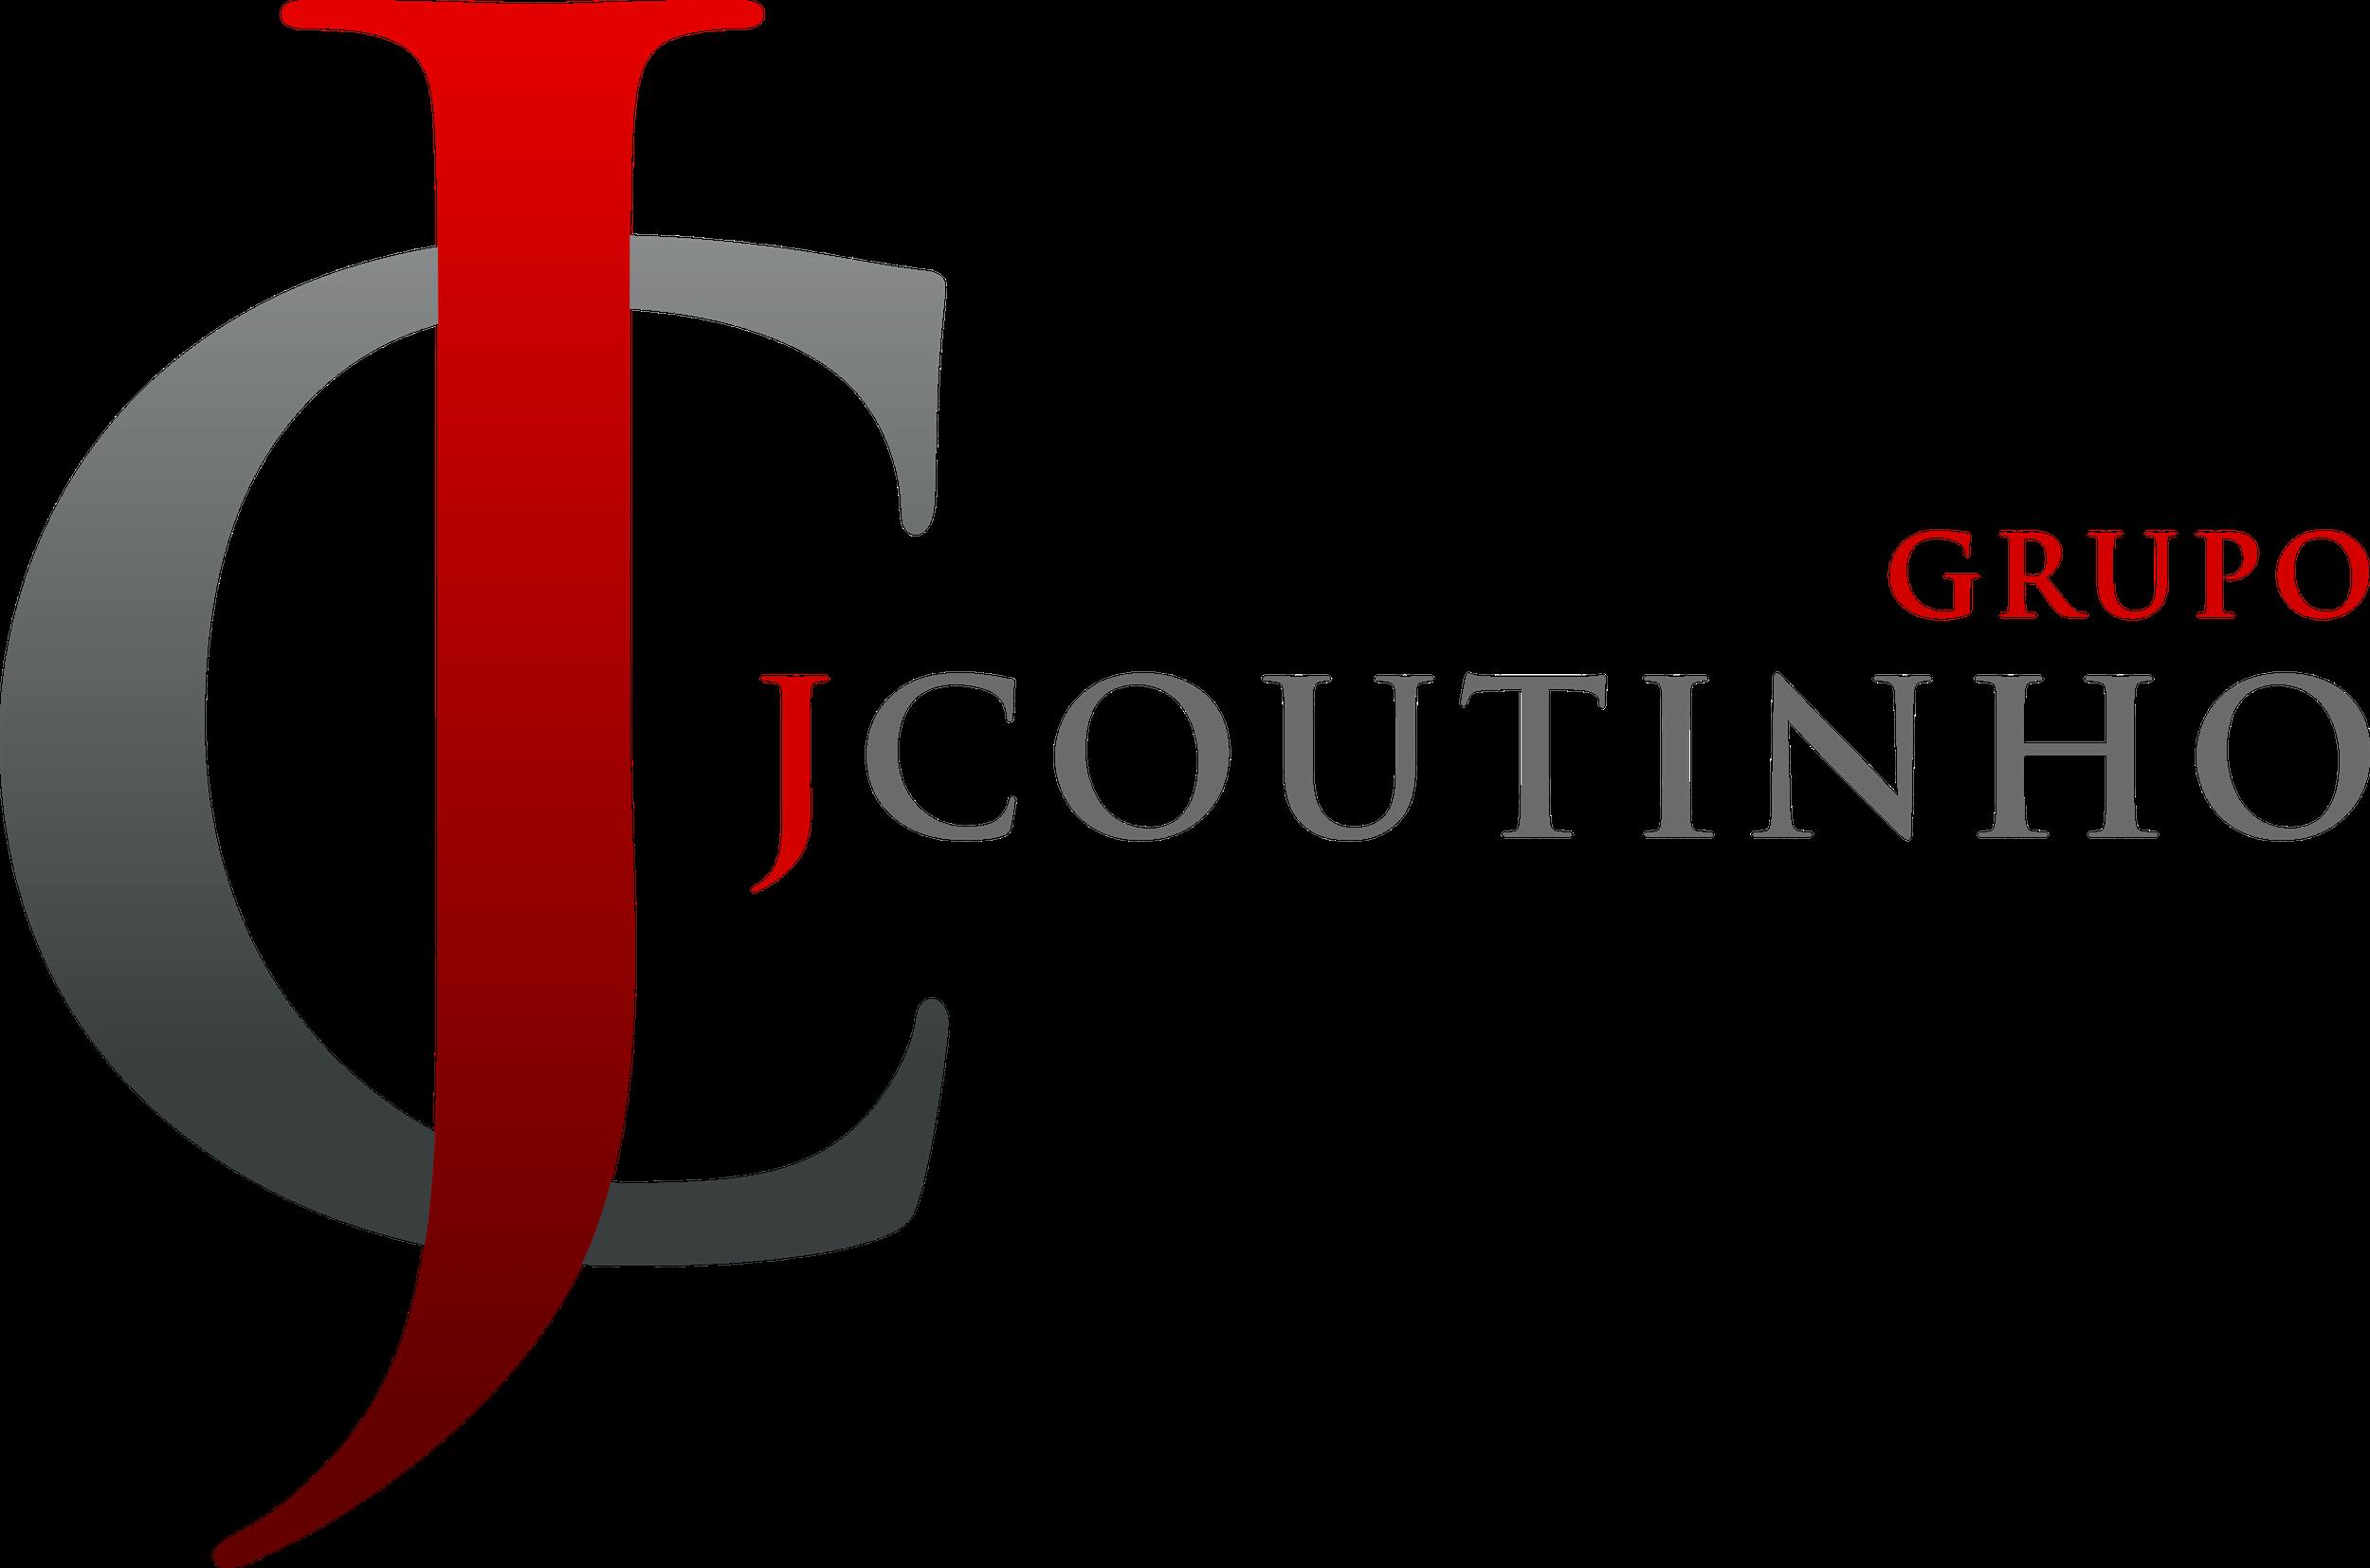 Grupo JCoutinho